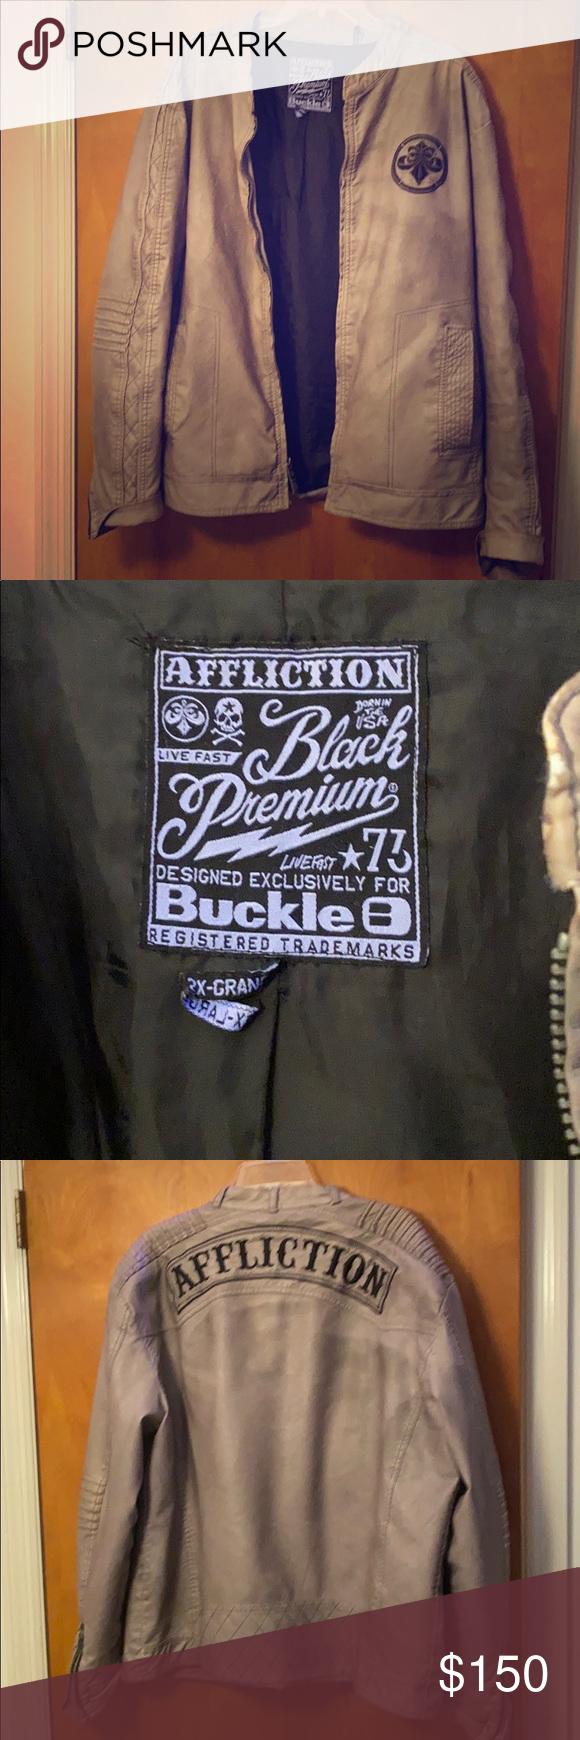 Affliction Leather Jacket Jackets, Tan leather jackets